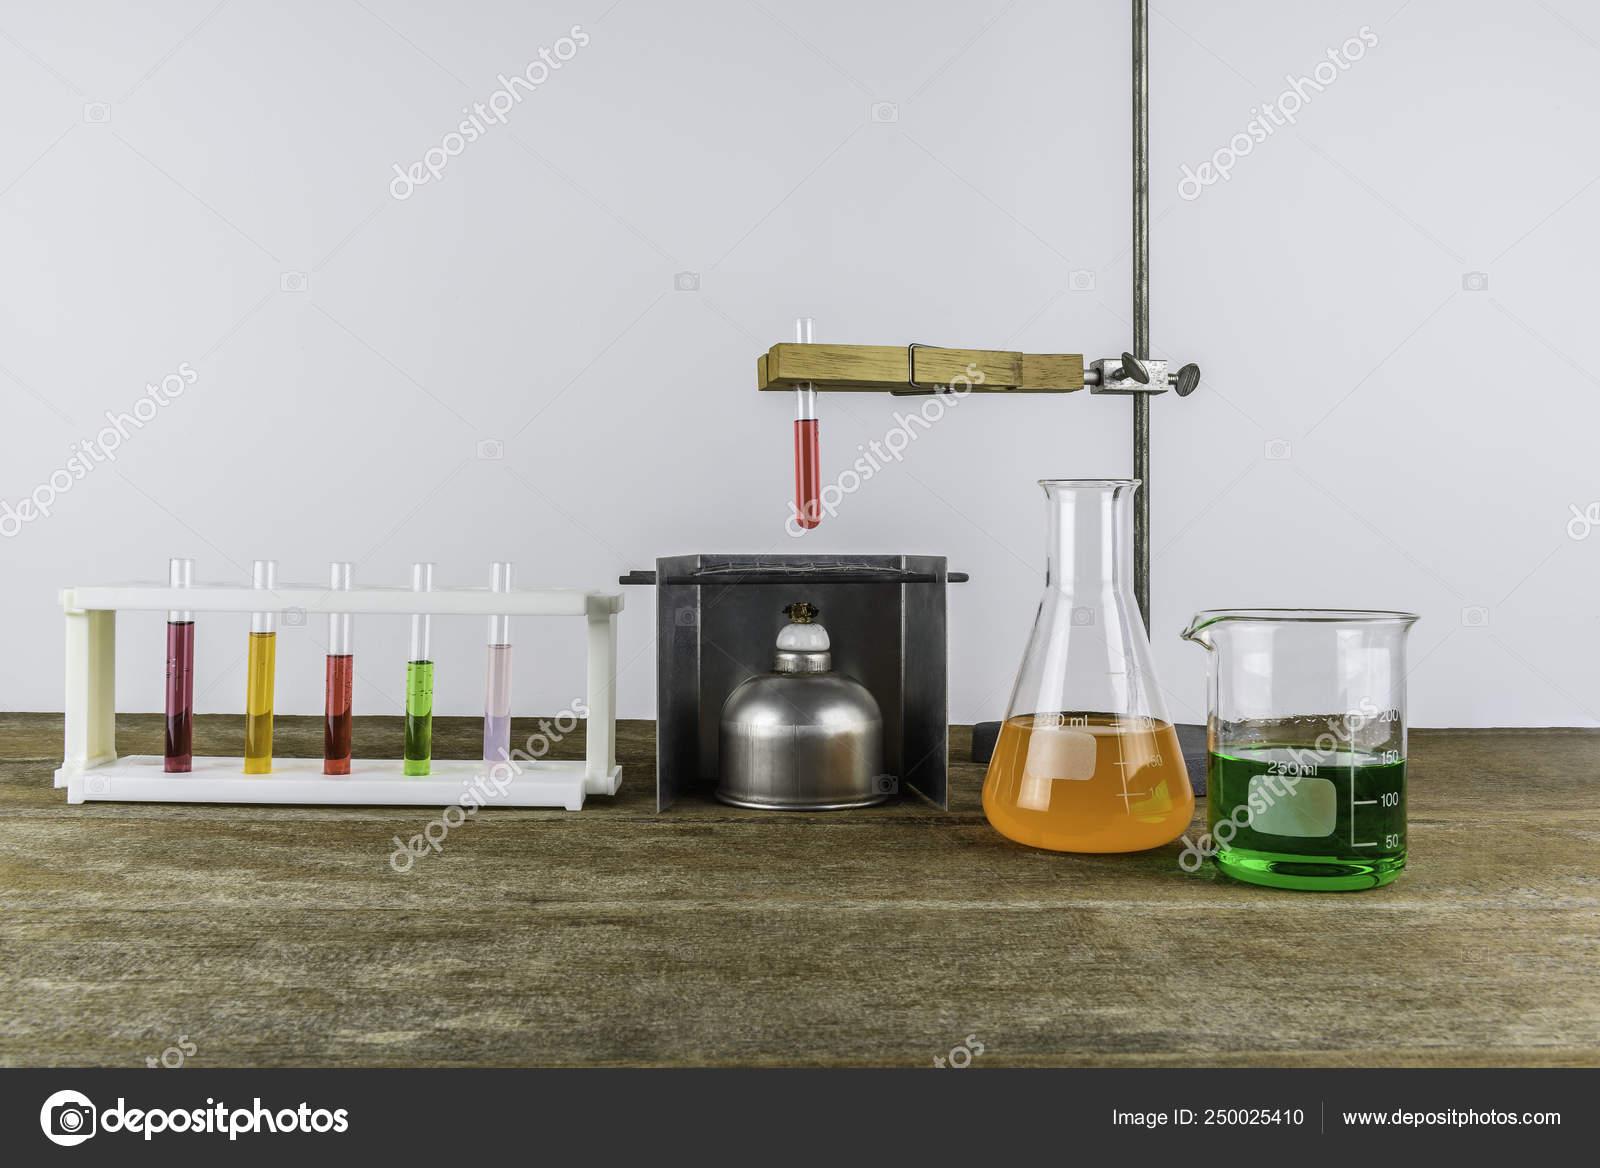 Laboratory equipment test tube holder and alcohol lamp, test tub